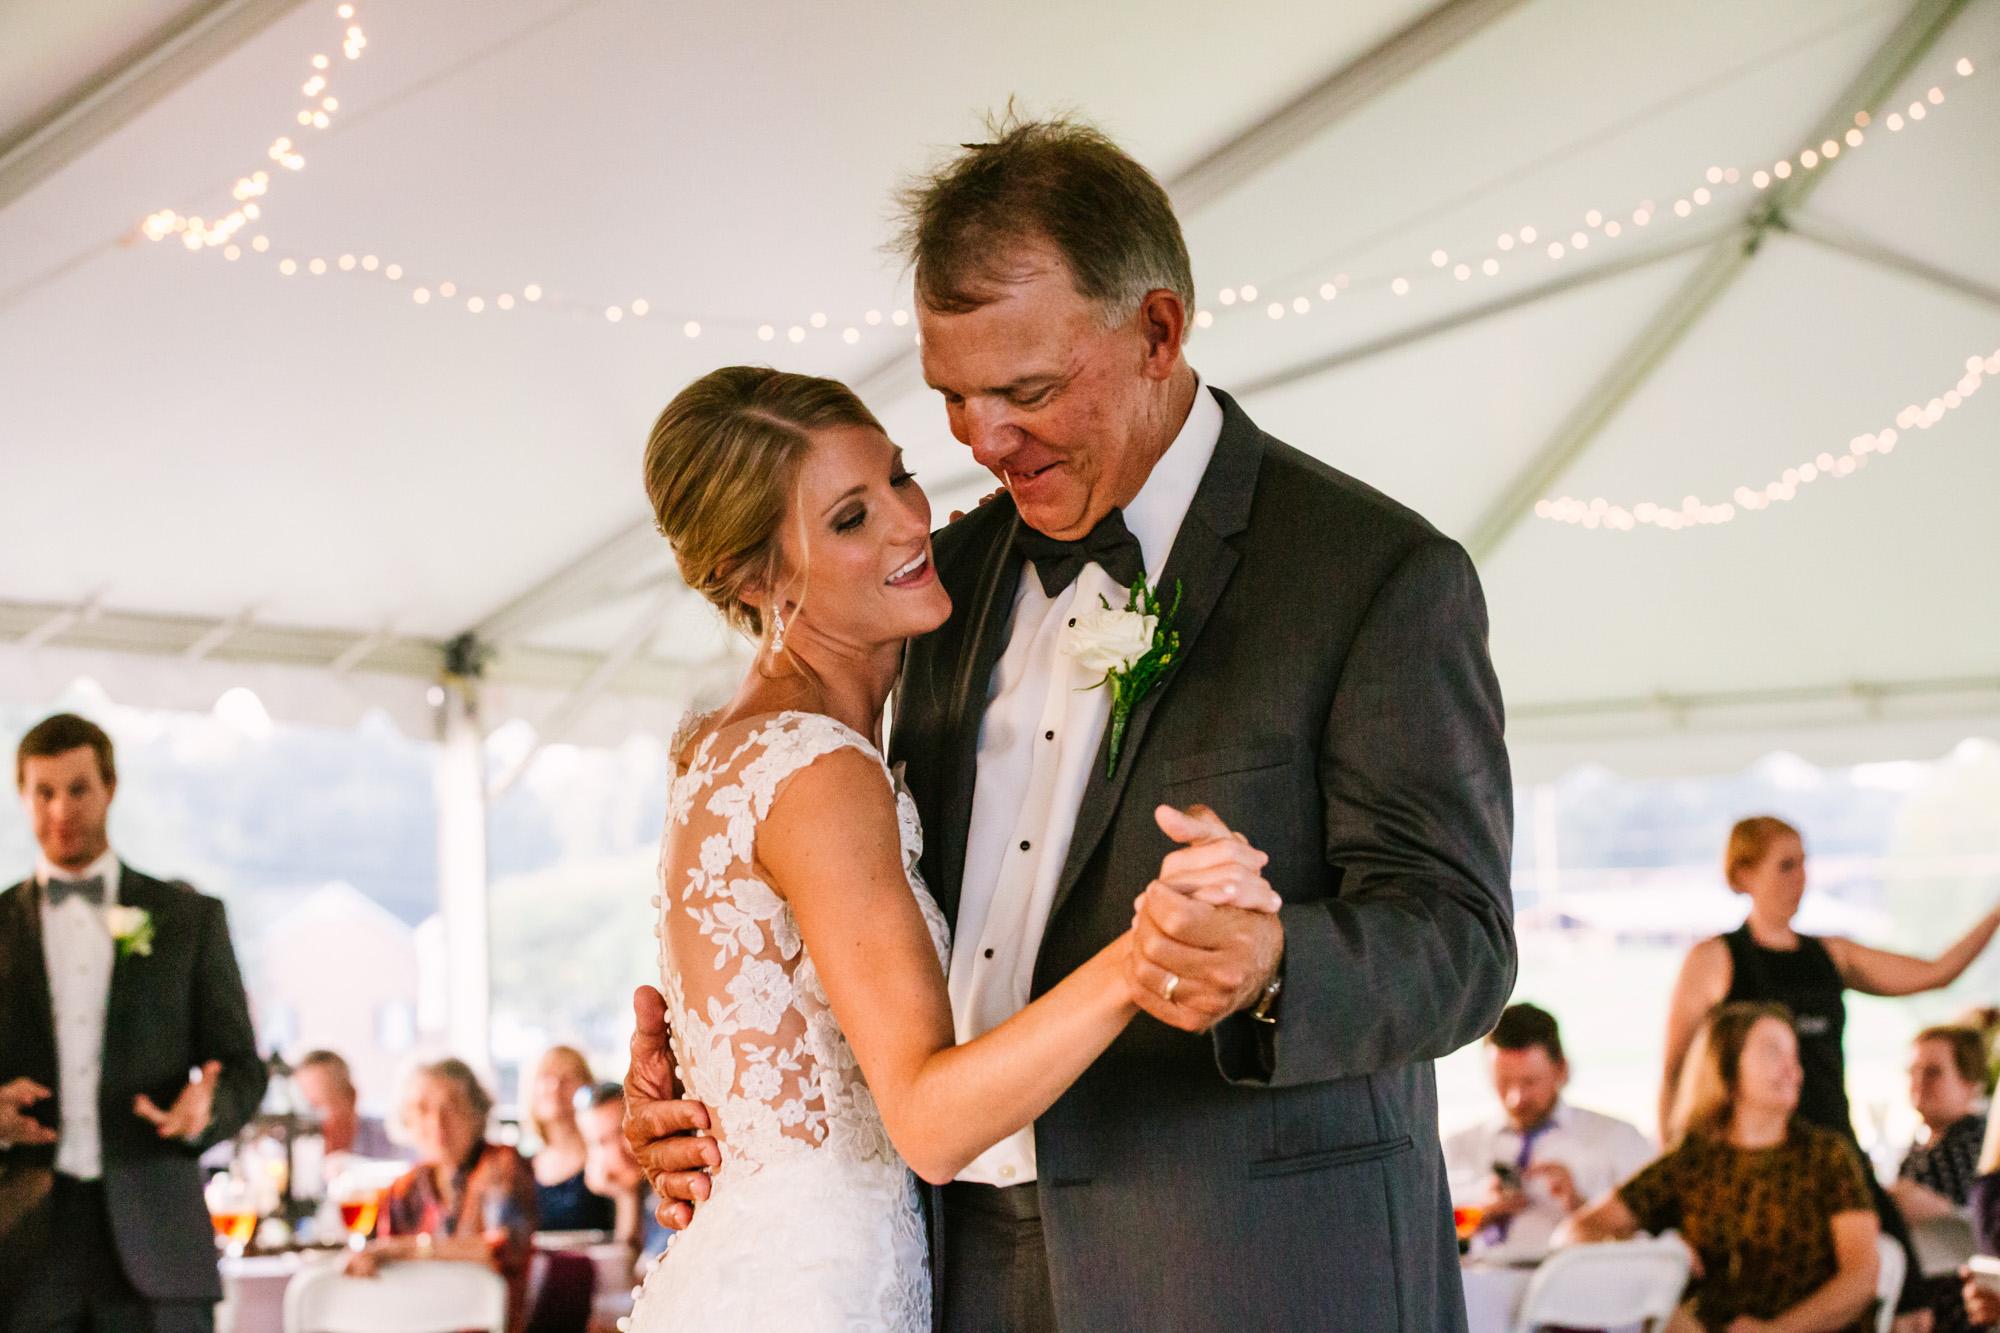 Waynesville, NC Wedding Photography | Father and Bride Dance